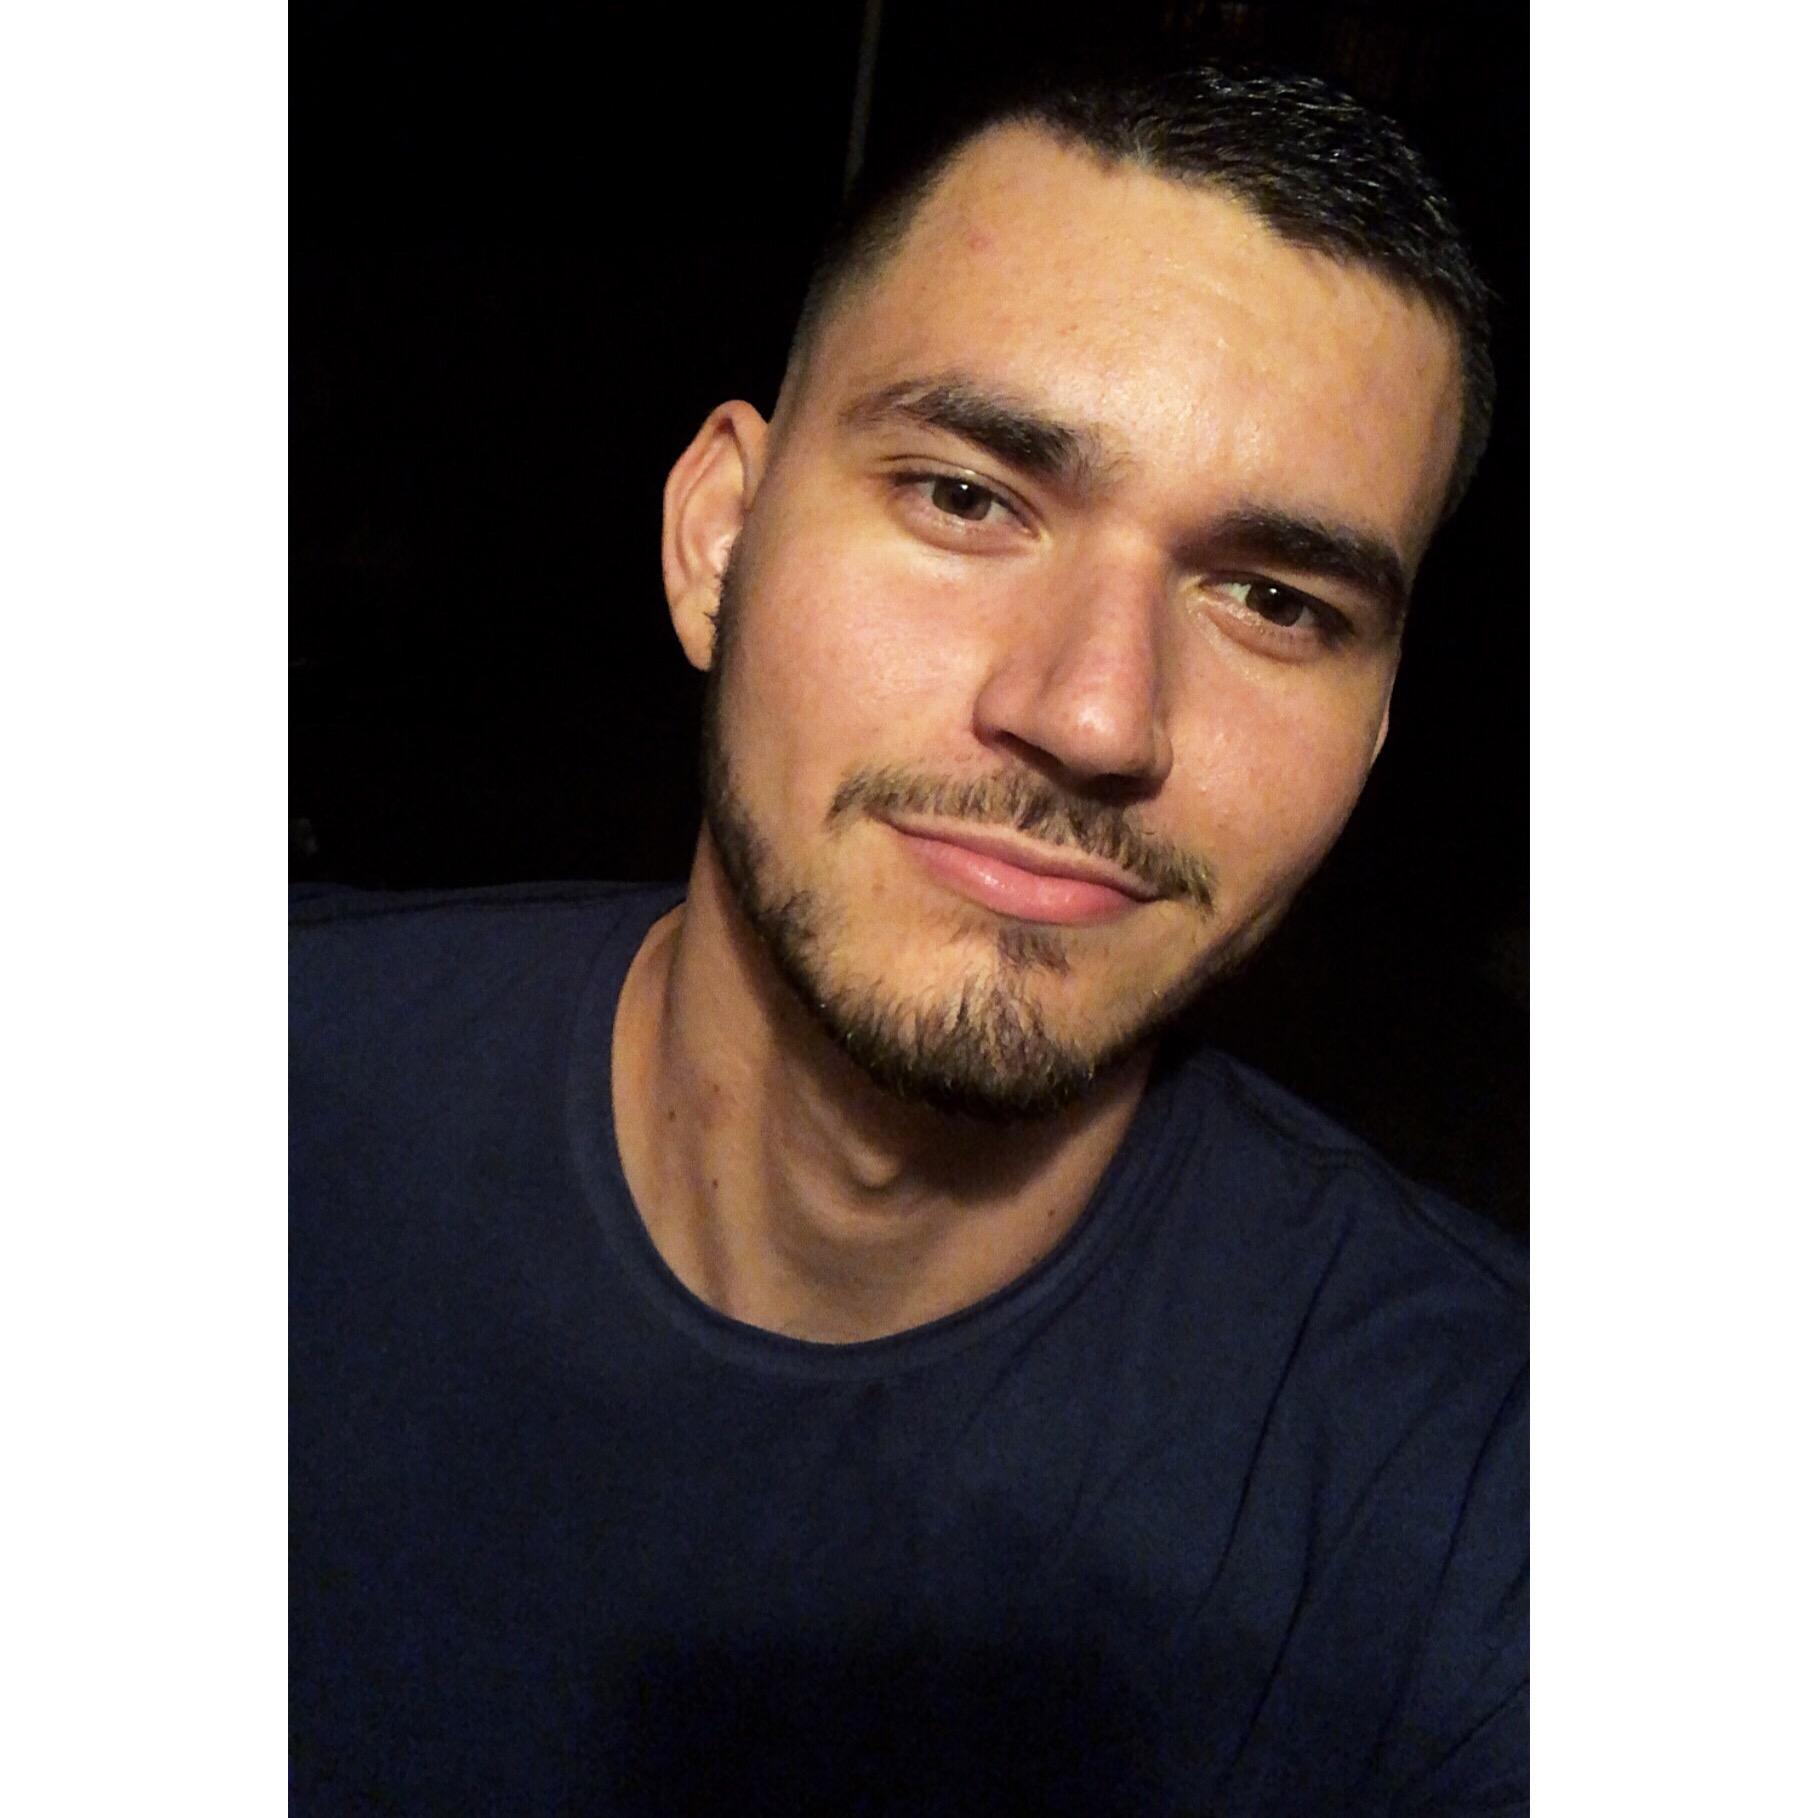 Juan Diego Zuñiga Fernandez